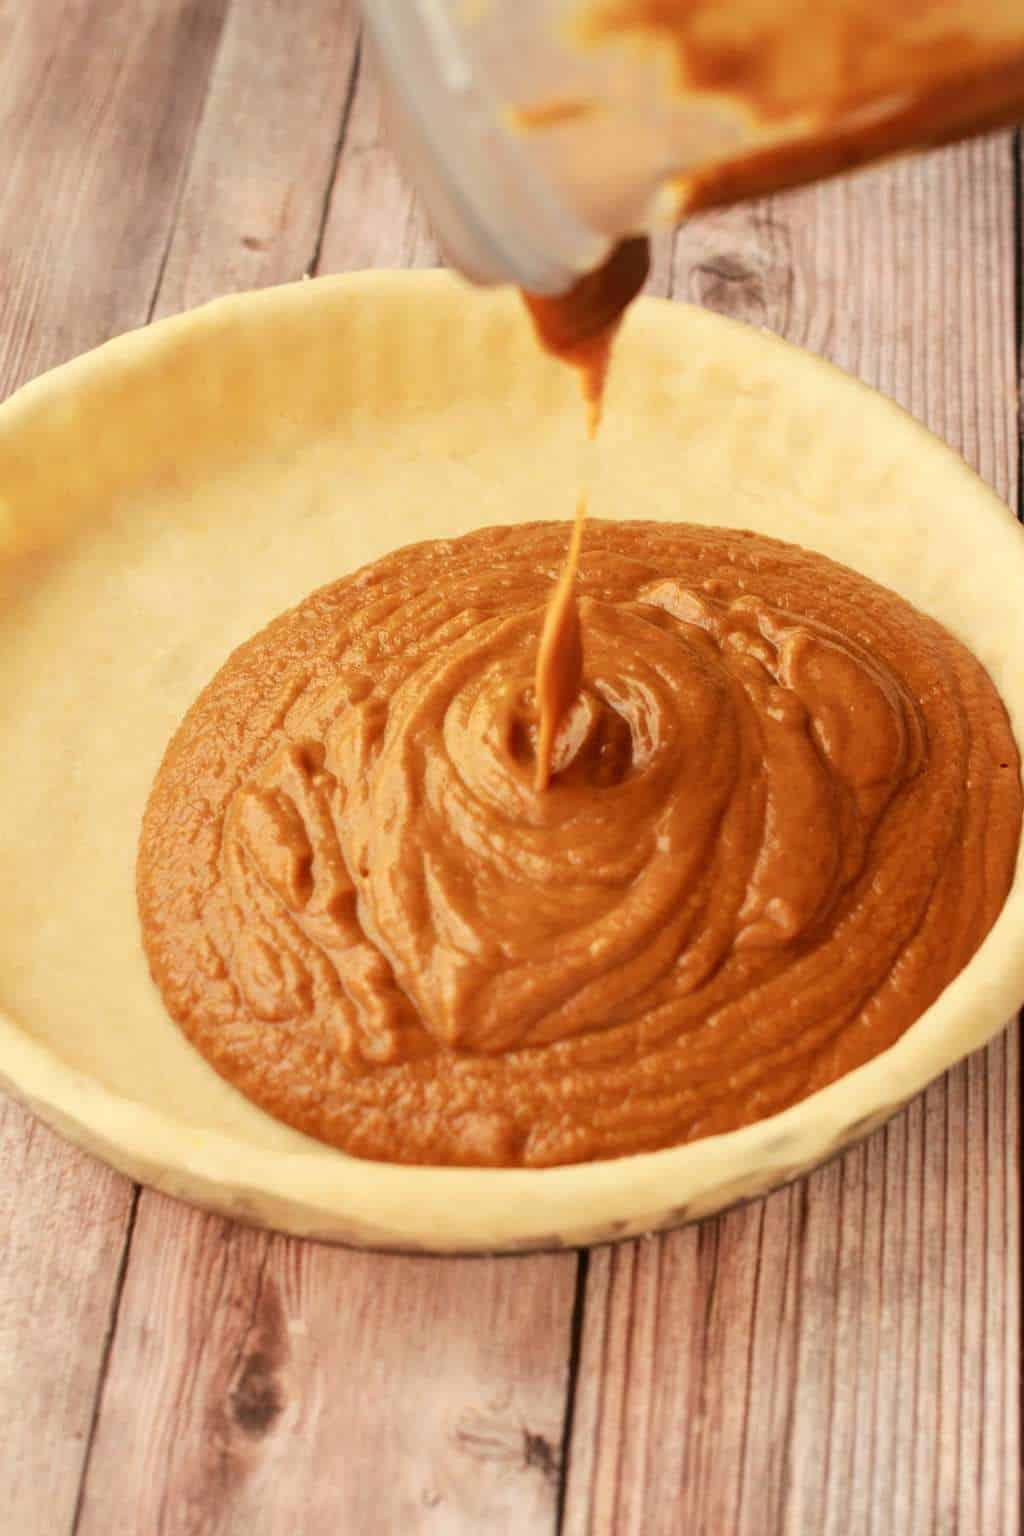 Pouring vegan pumpkin pie filling into a pie crust.